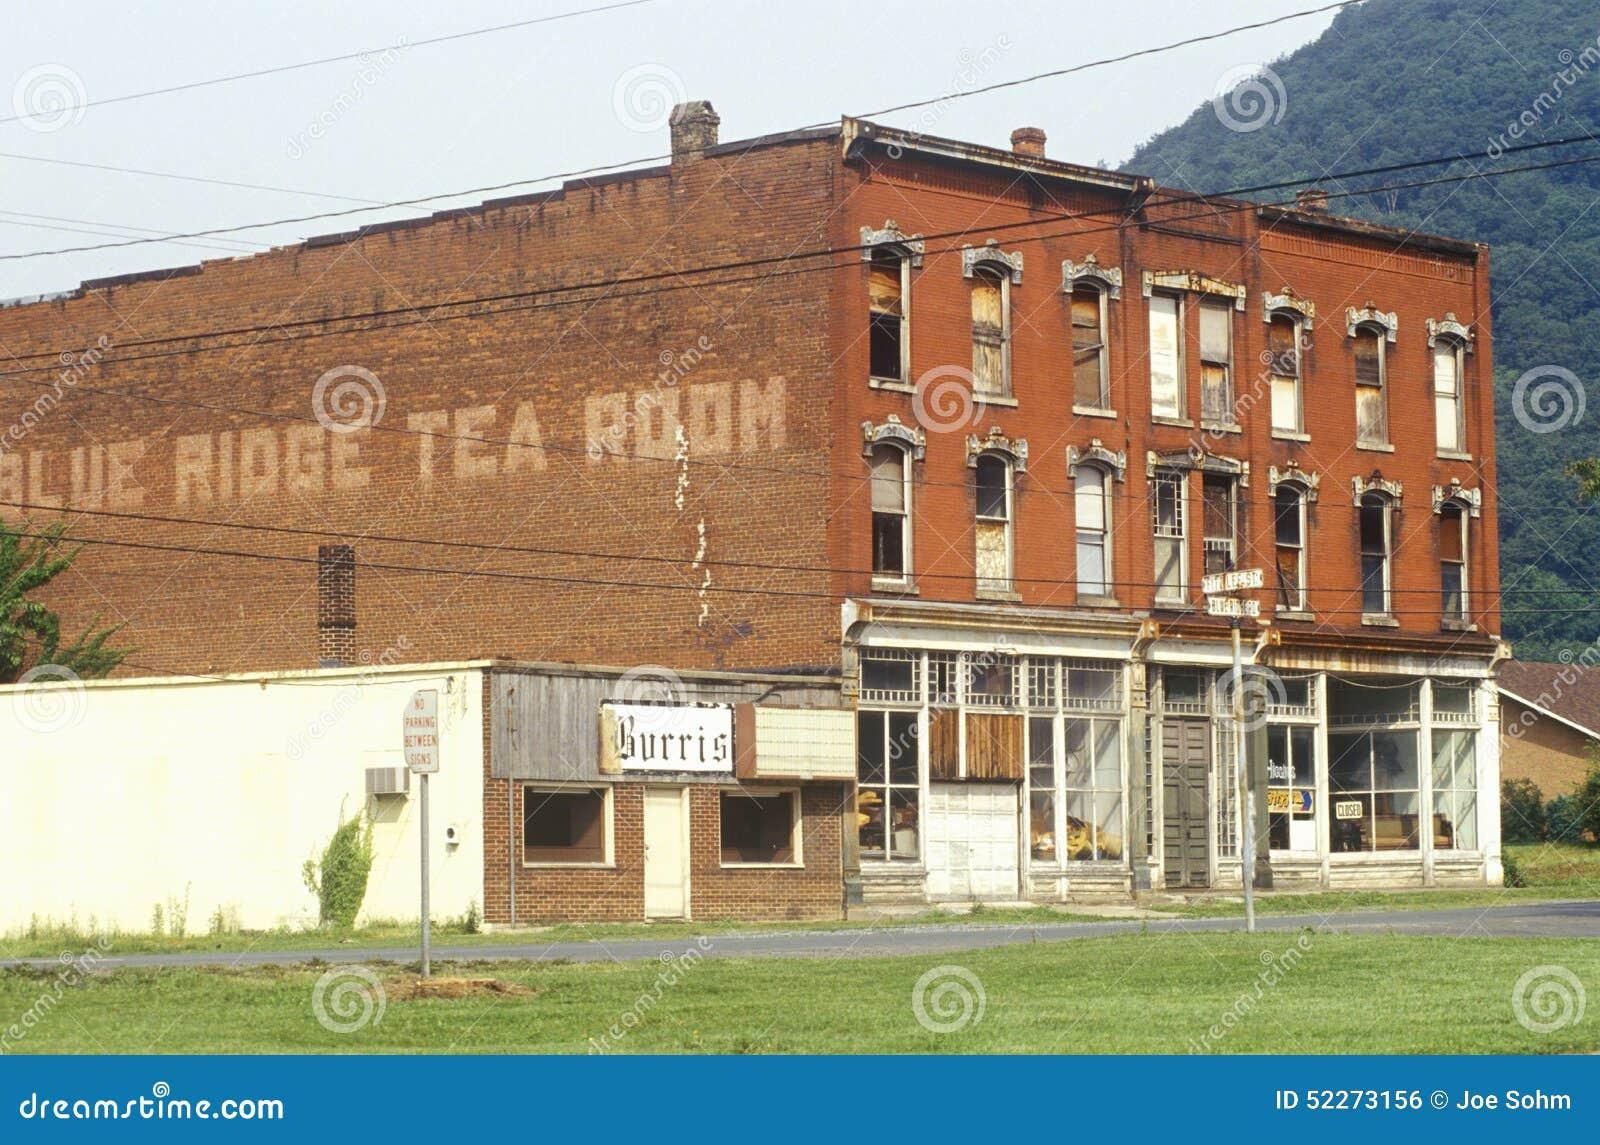 Blauw Ridge Tea Room in Appalachia, VA